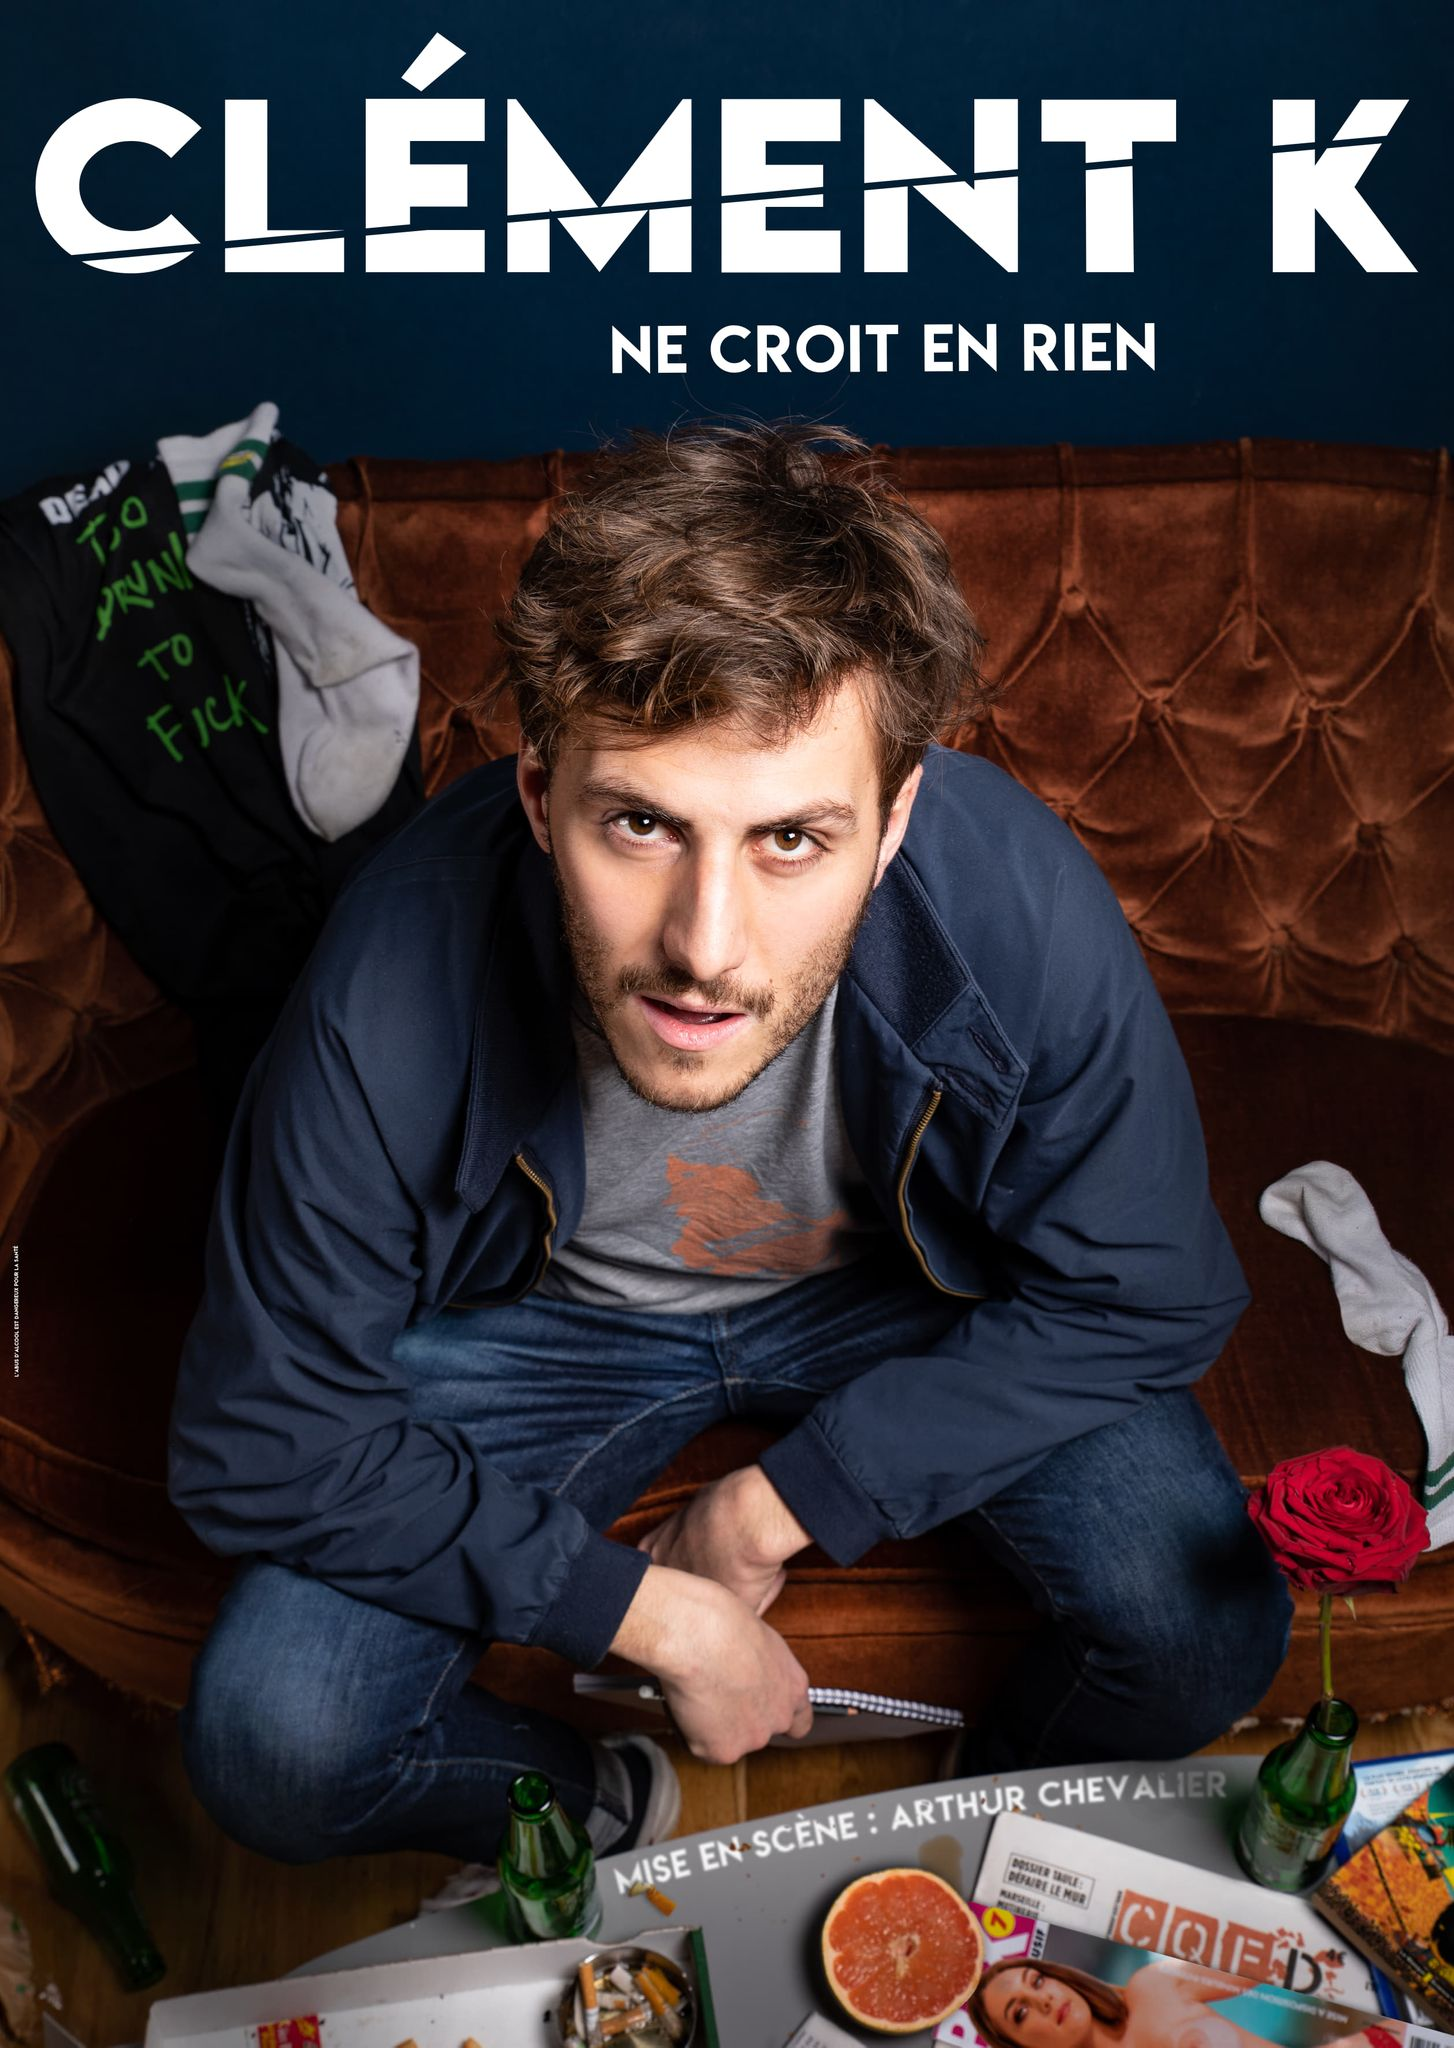 Clément K - One man - Stand Up - Humour - Art Dû - 13006 - Marseille